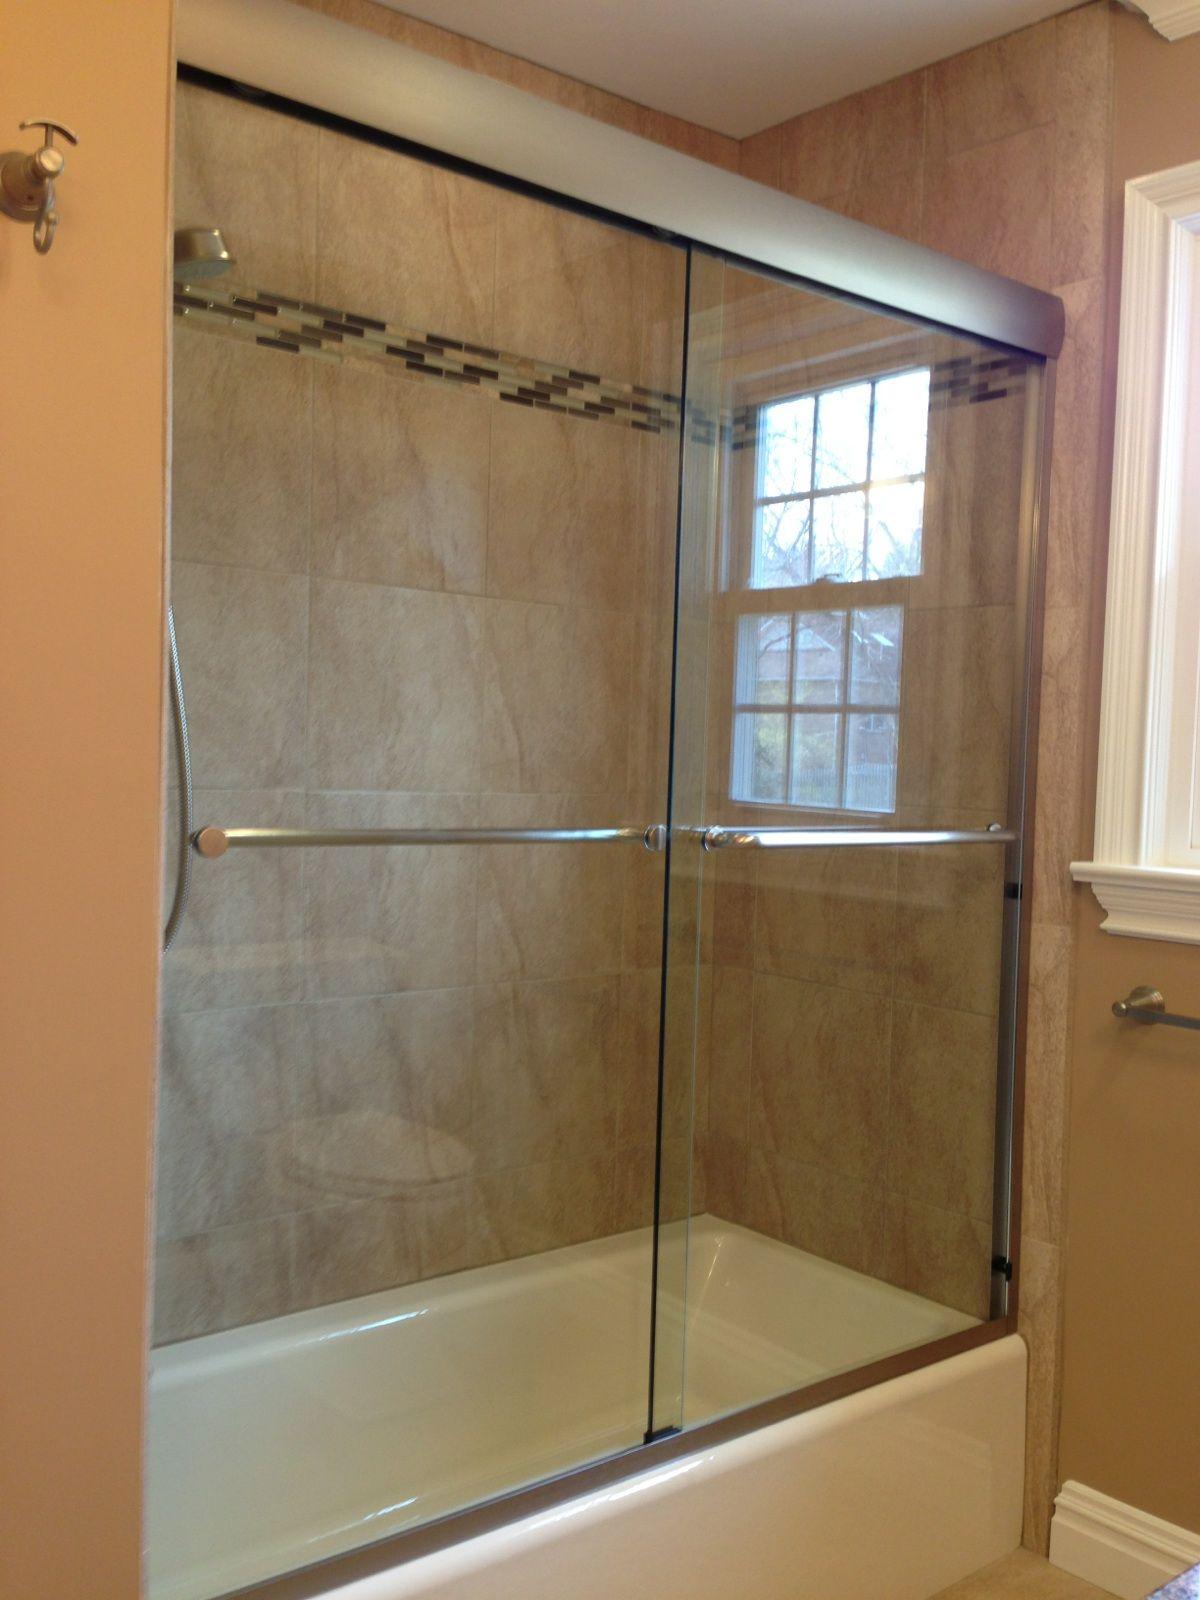 Frameless Shower Door with Head rail | Shower Doors with Headrail ...